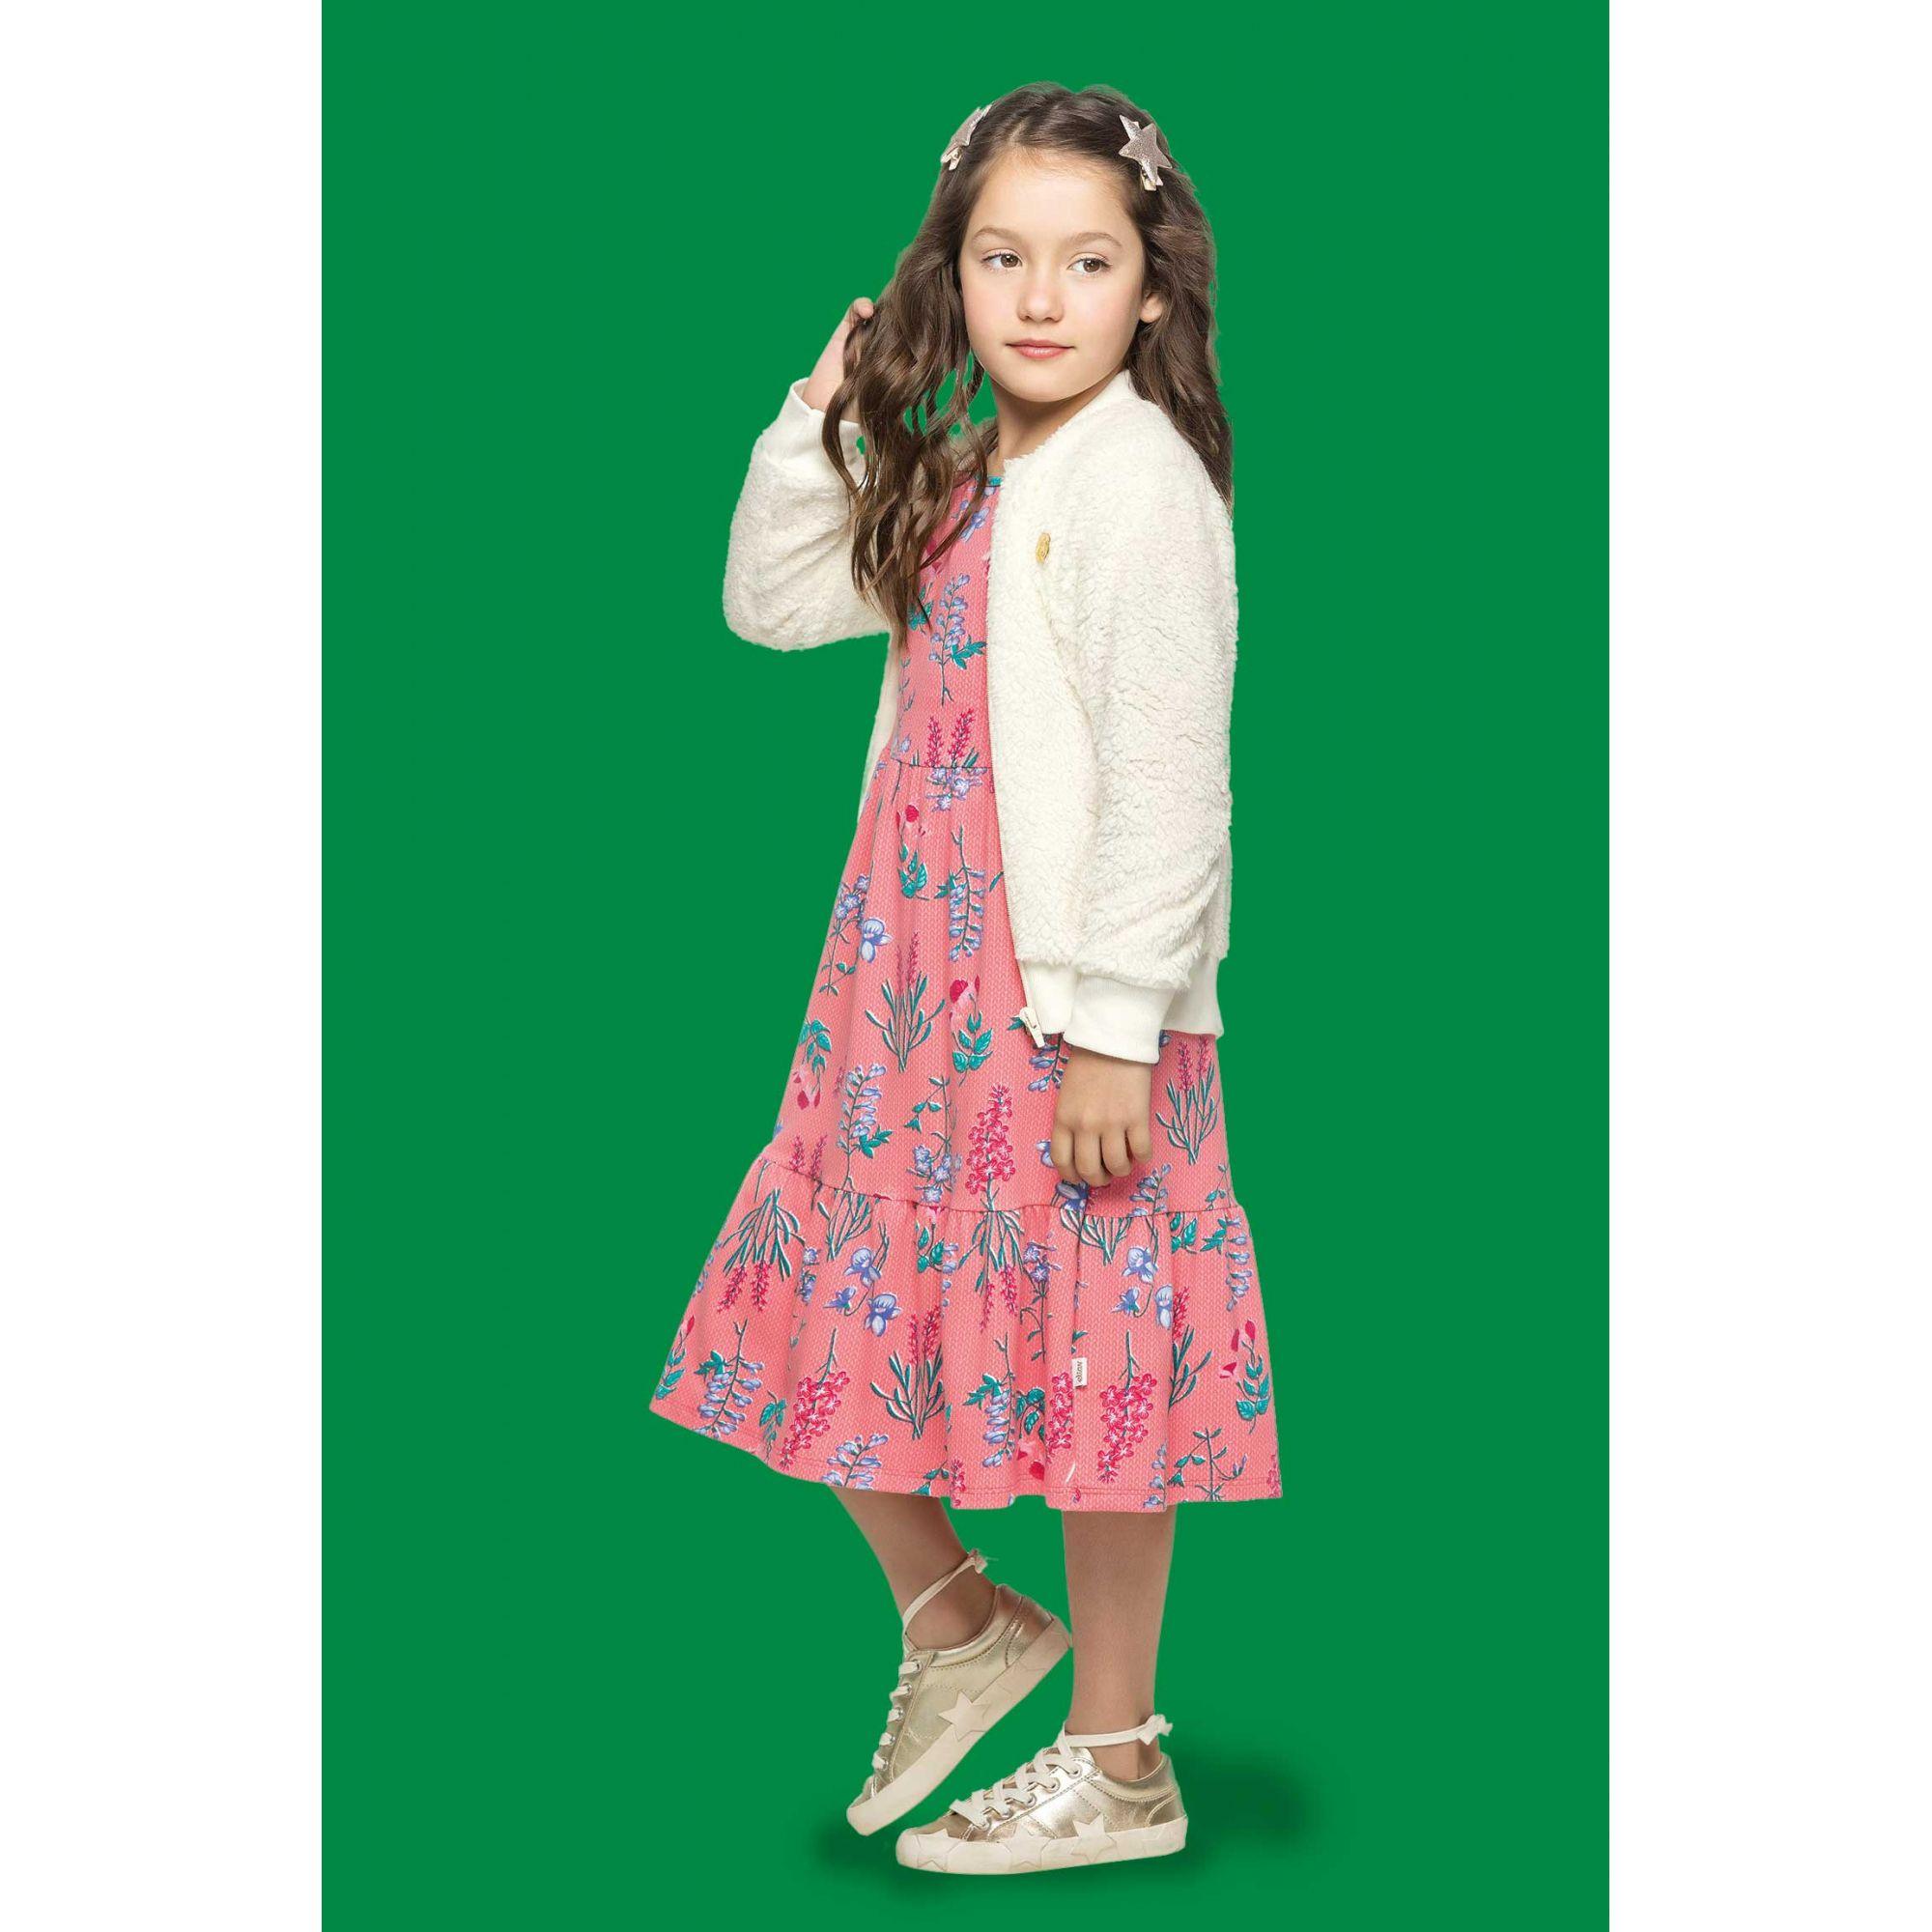 Vestido Infantil Inverno Rosa Flores Elian